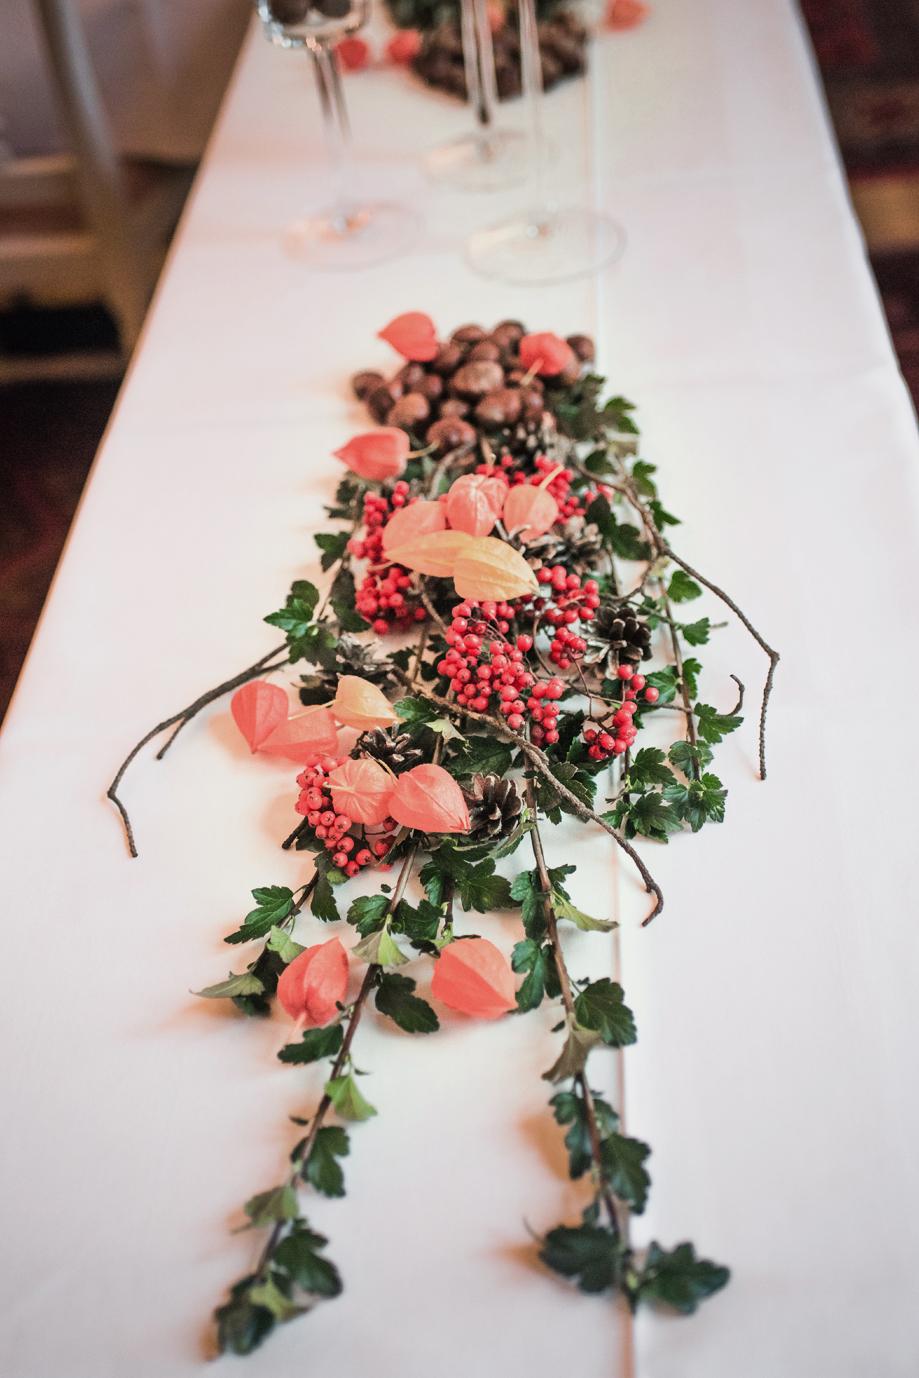 Romantic Fall Wedding at Rånäs Slott Bröllopsfotograf Stockholm Umeå. Wedding photographer